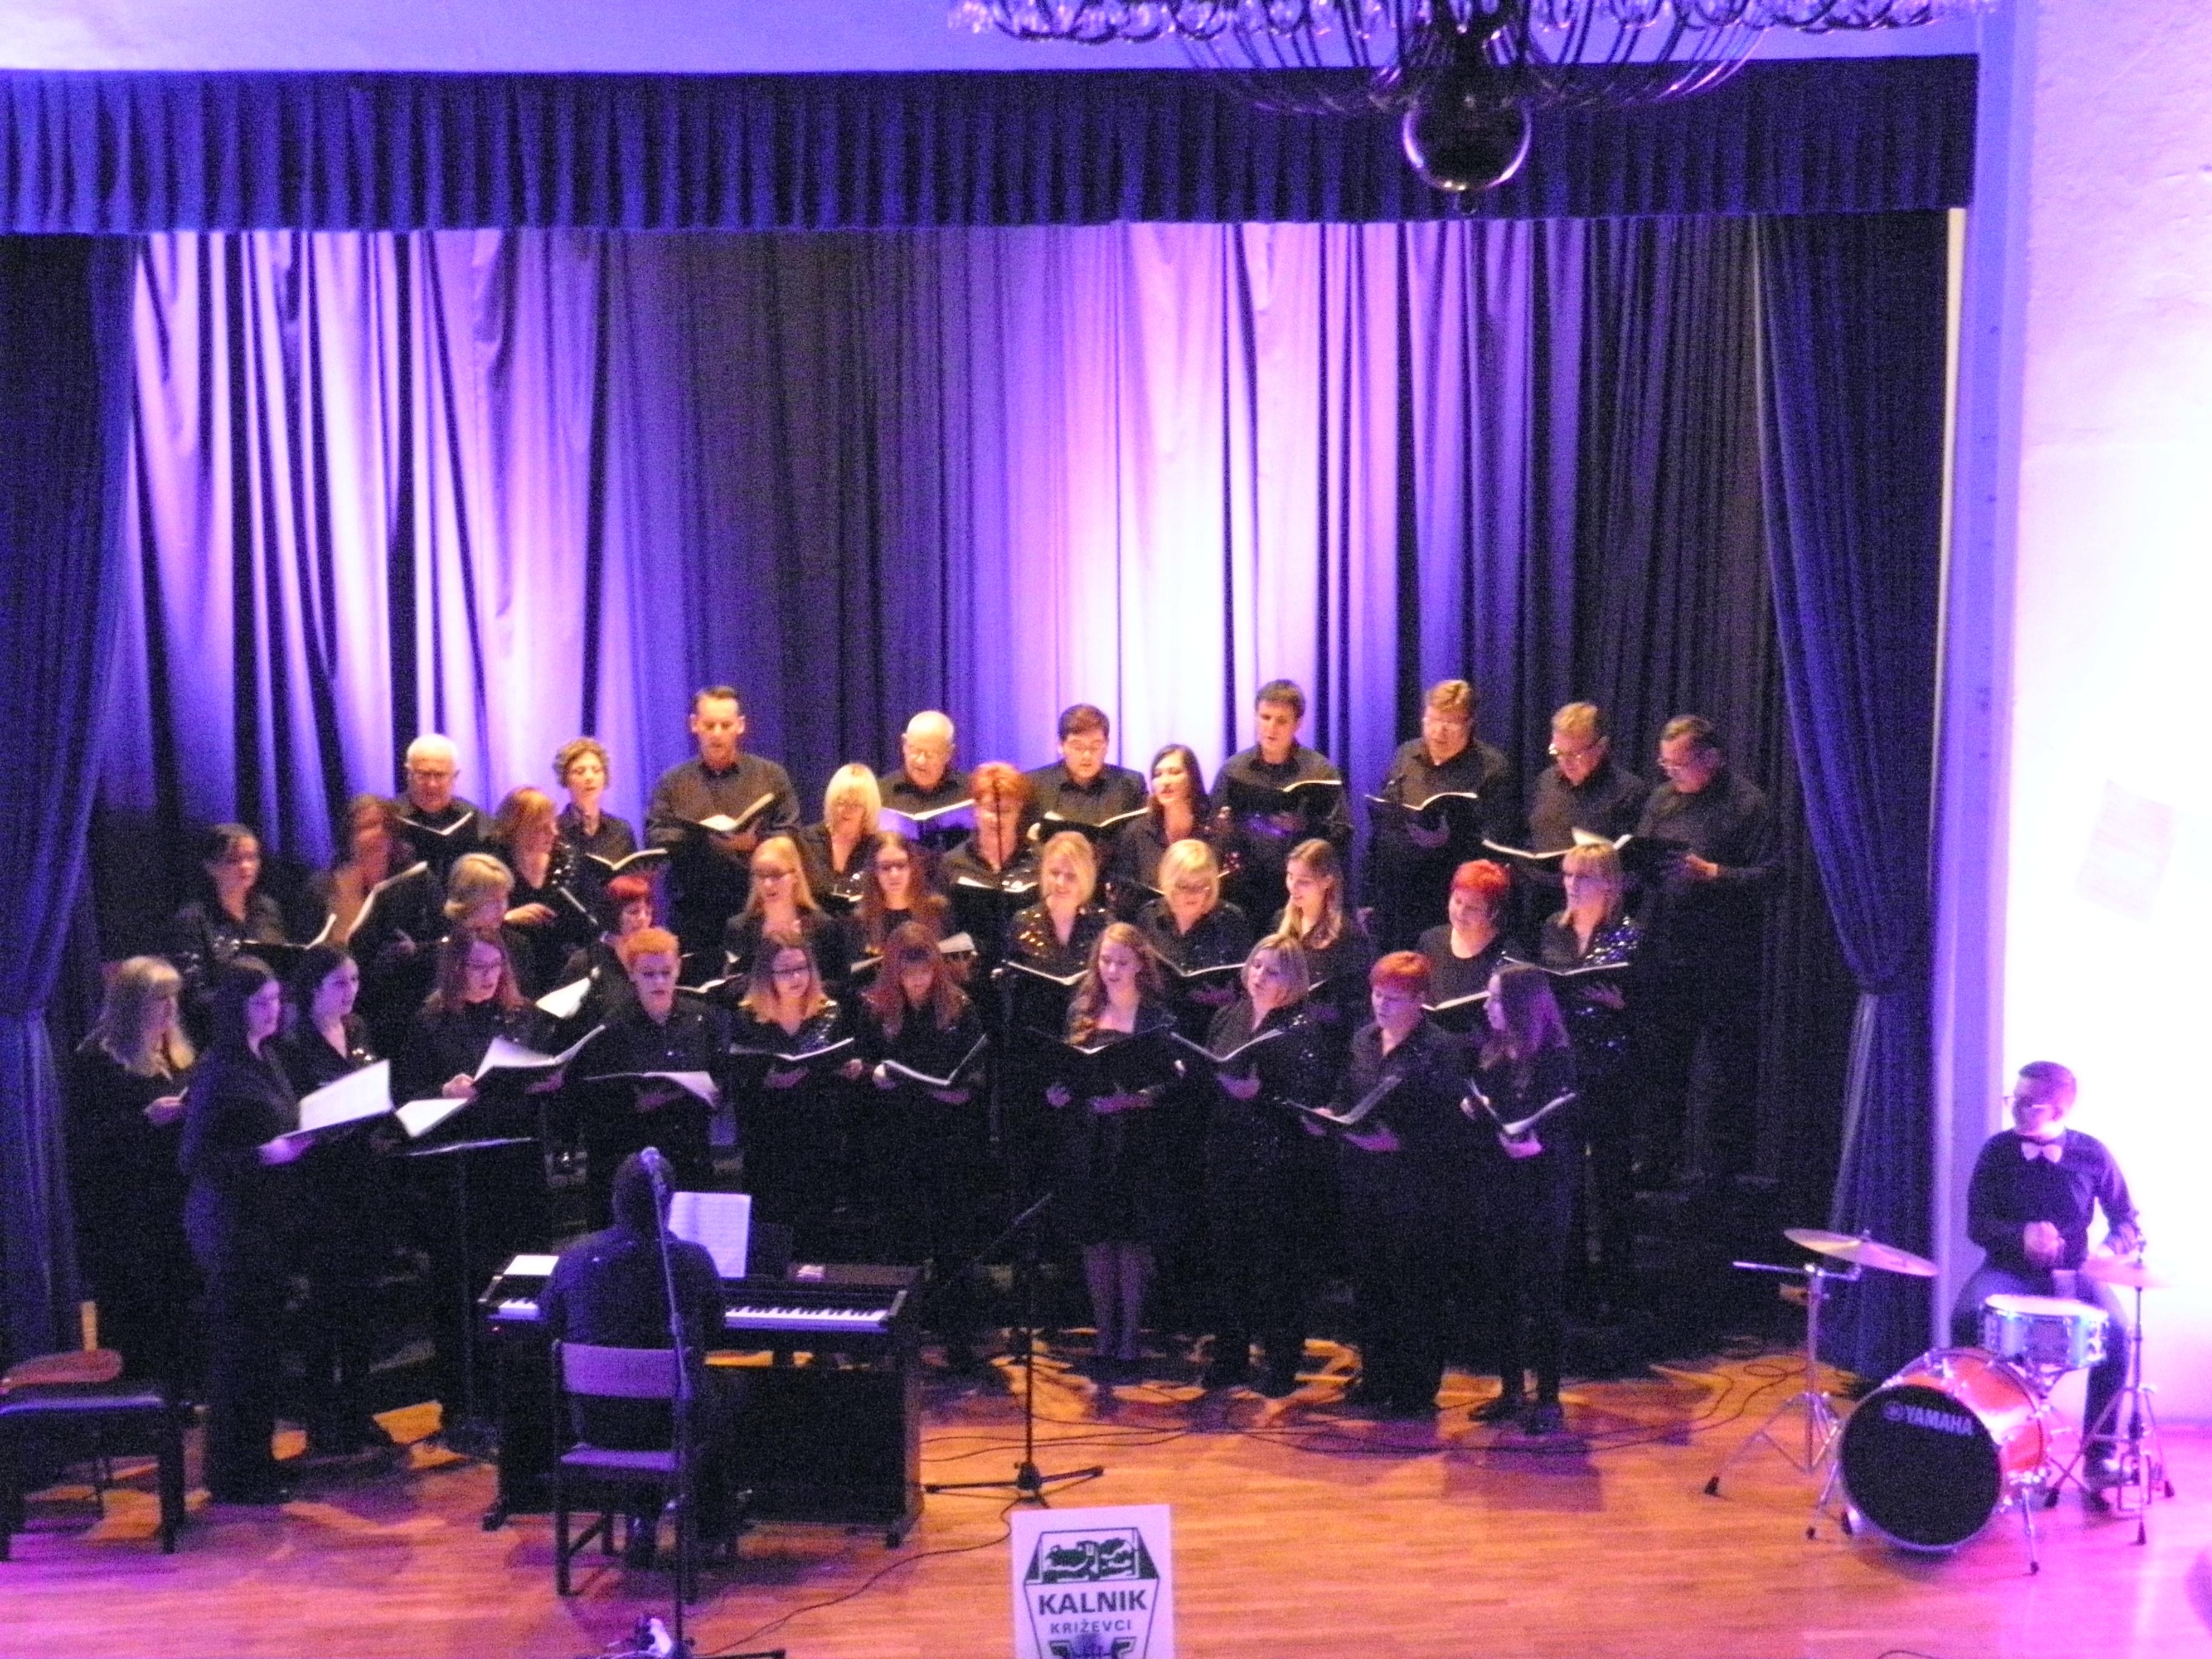 Godišnji koncert HPD Kalnik 25. studenoga 2016. (foto: R.Matić)